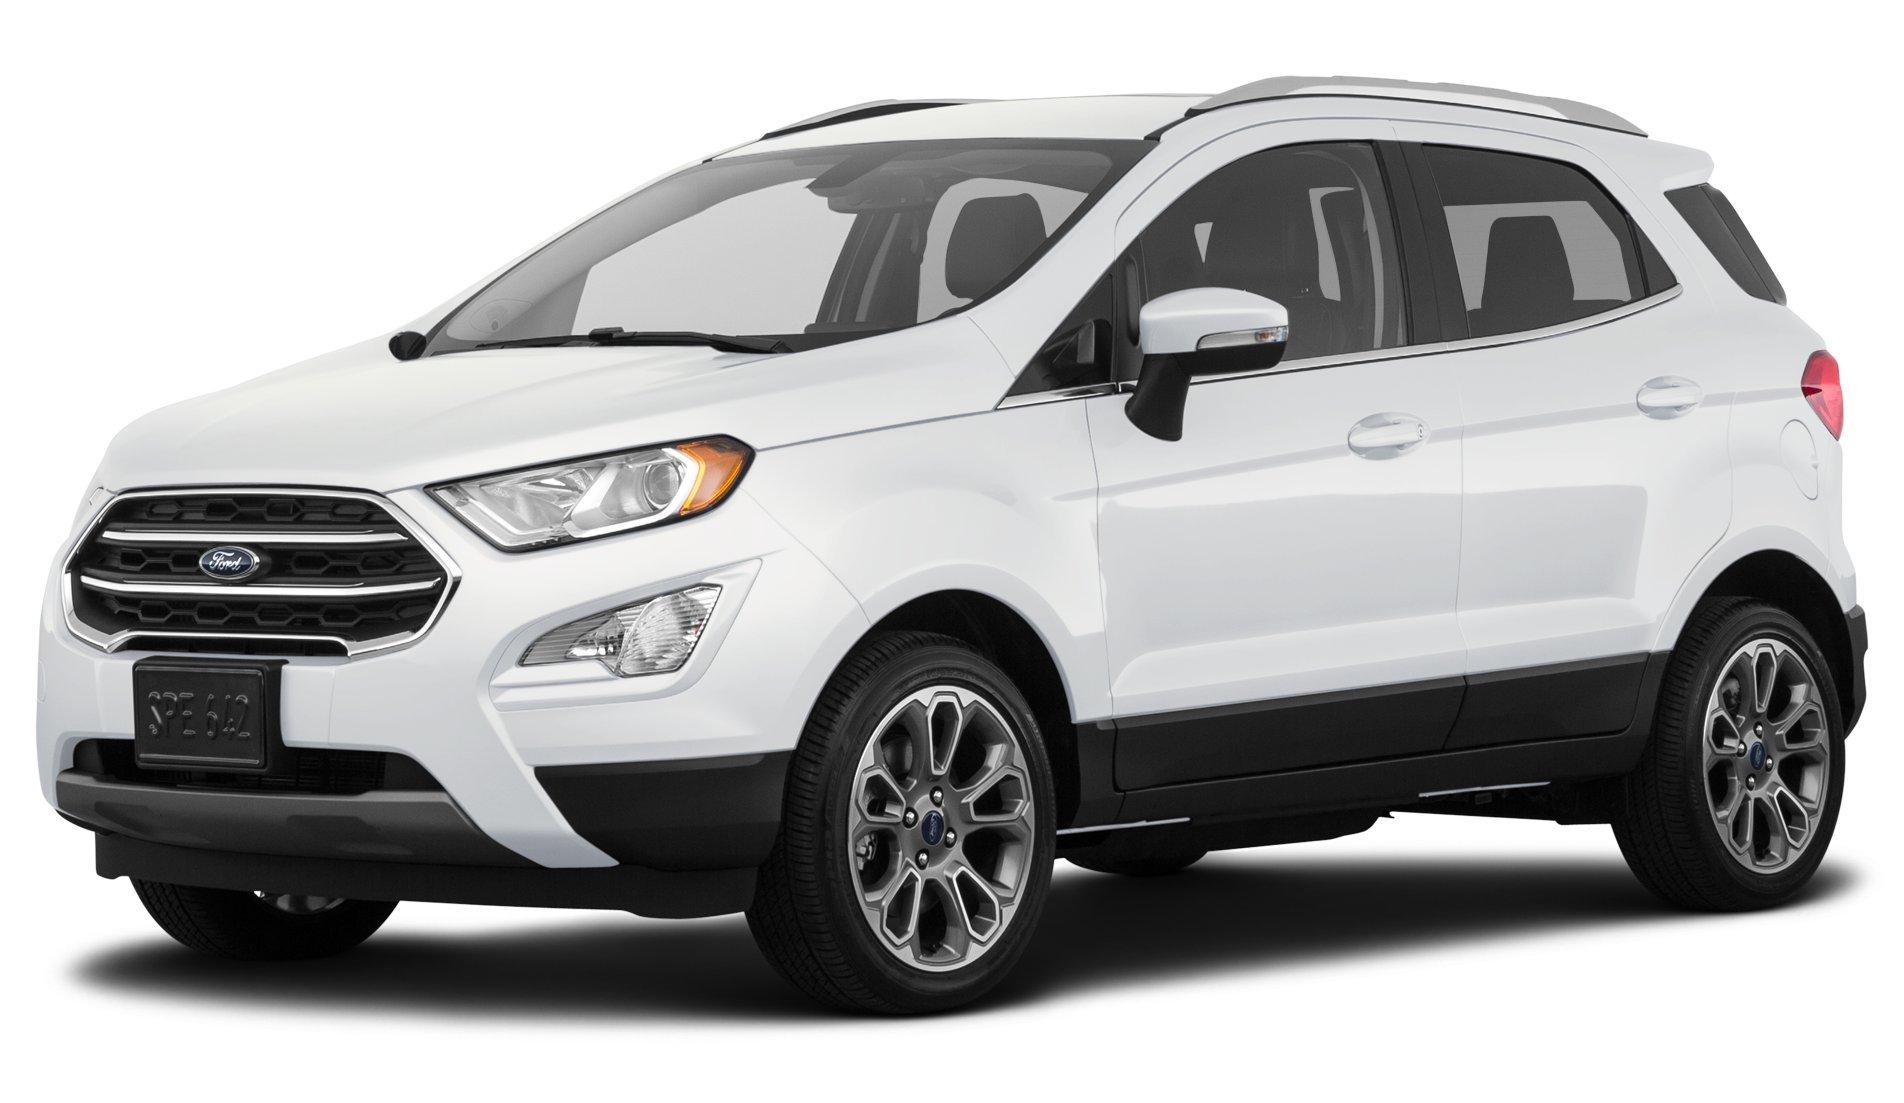 Amazon 2018 Jeep Cherokee Reviews and Specs Vehicles